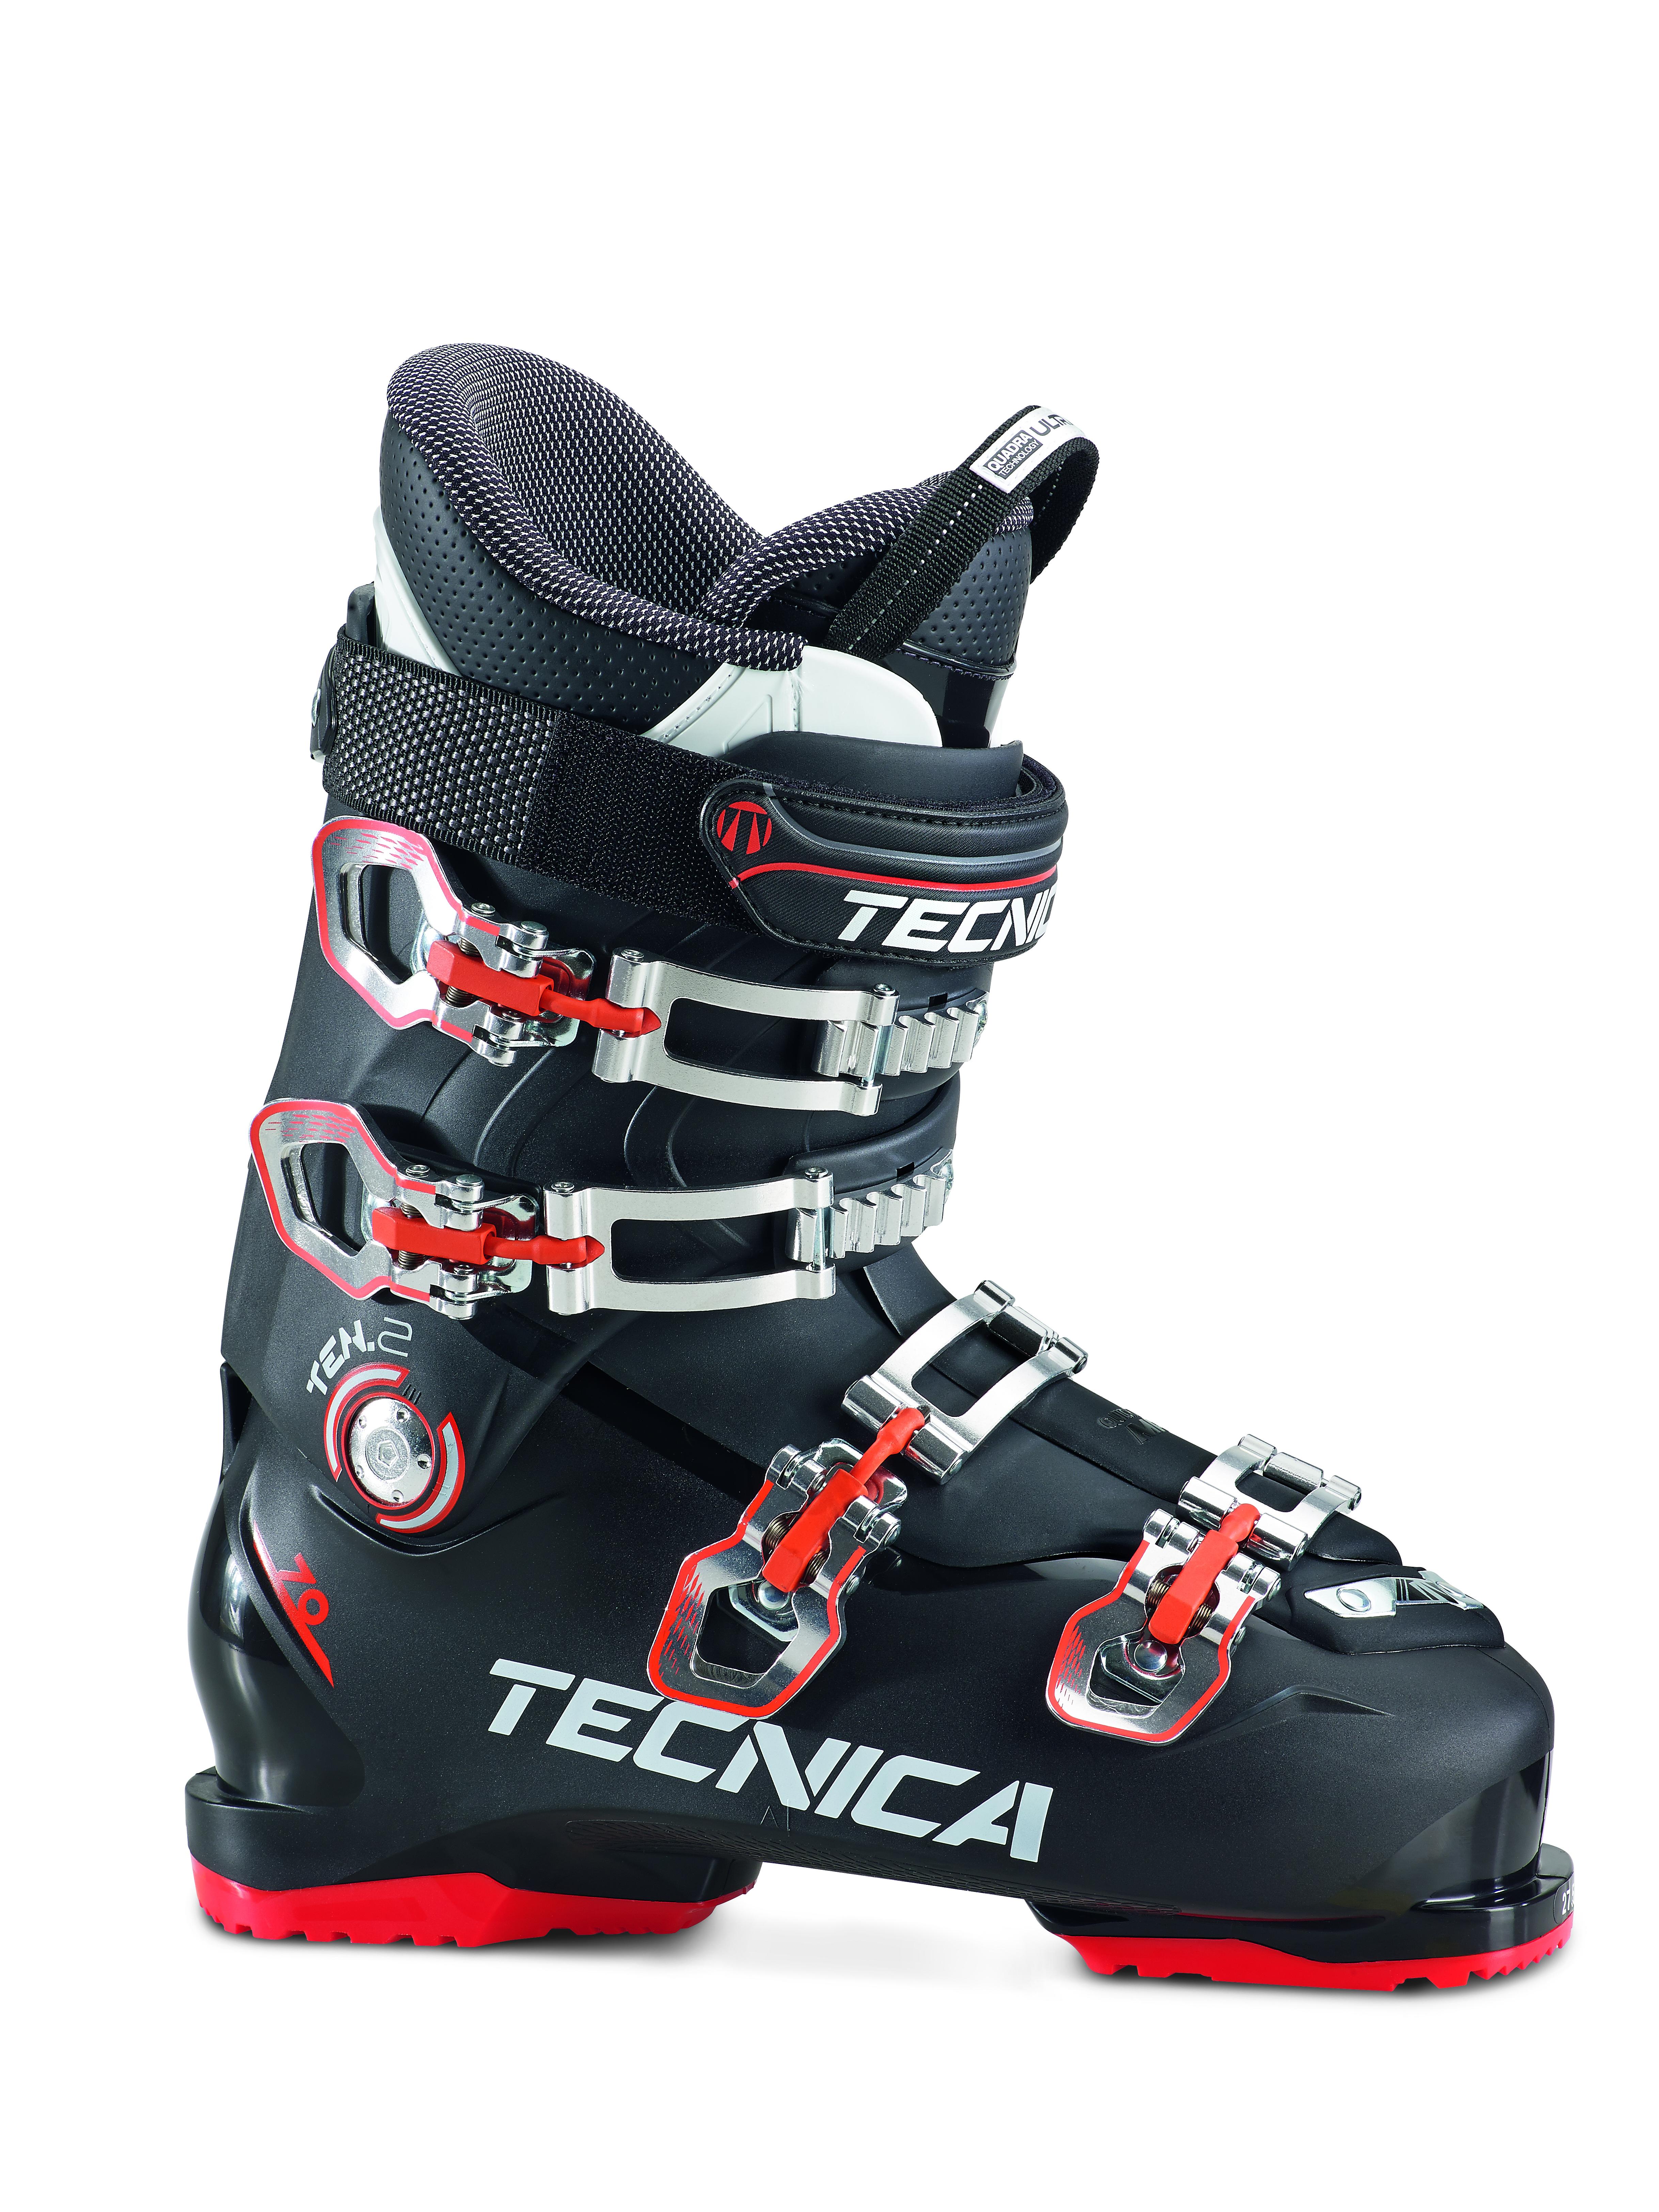 TECNICA TEN.2 70 HVL 285